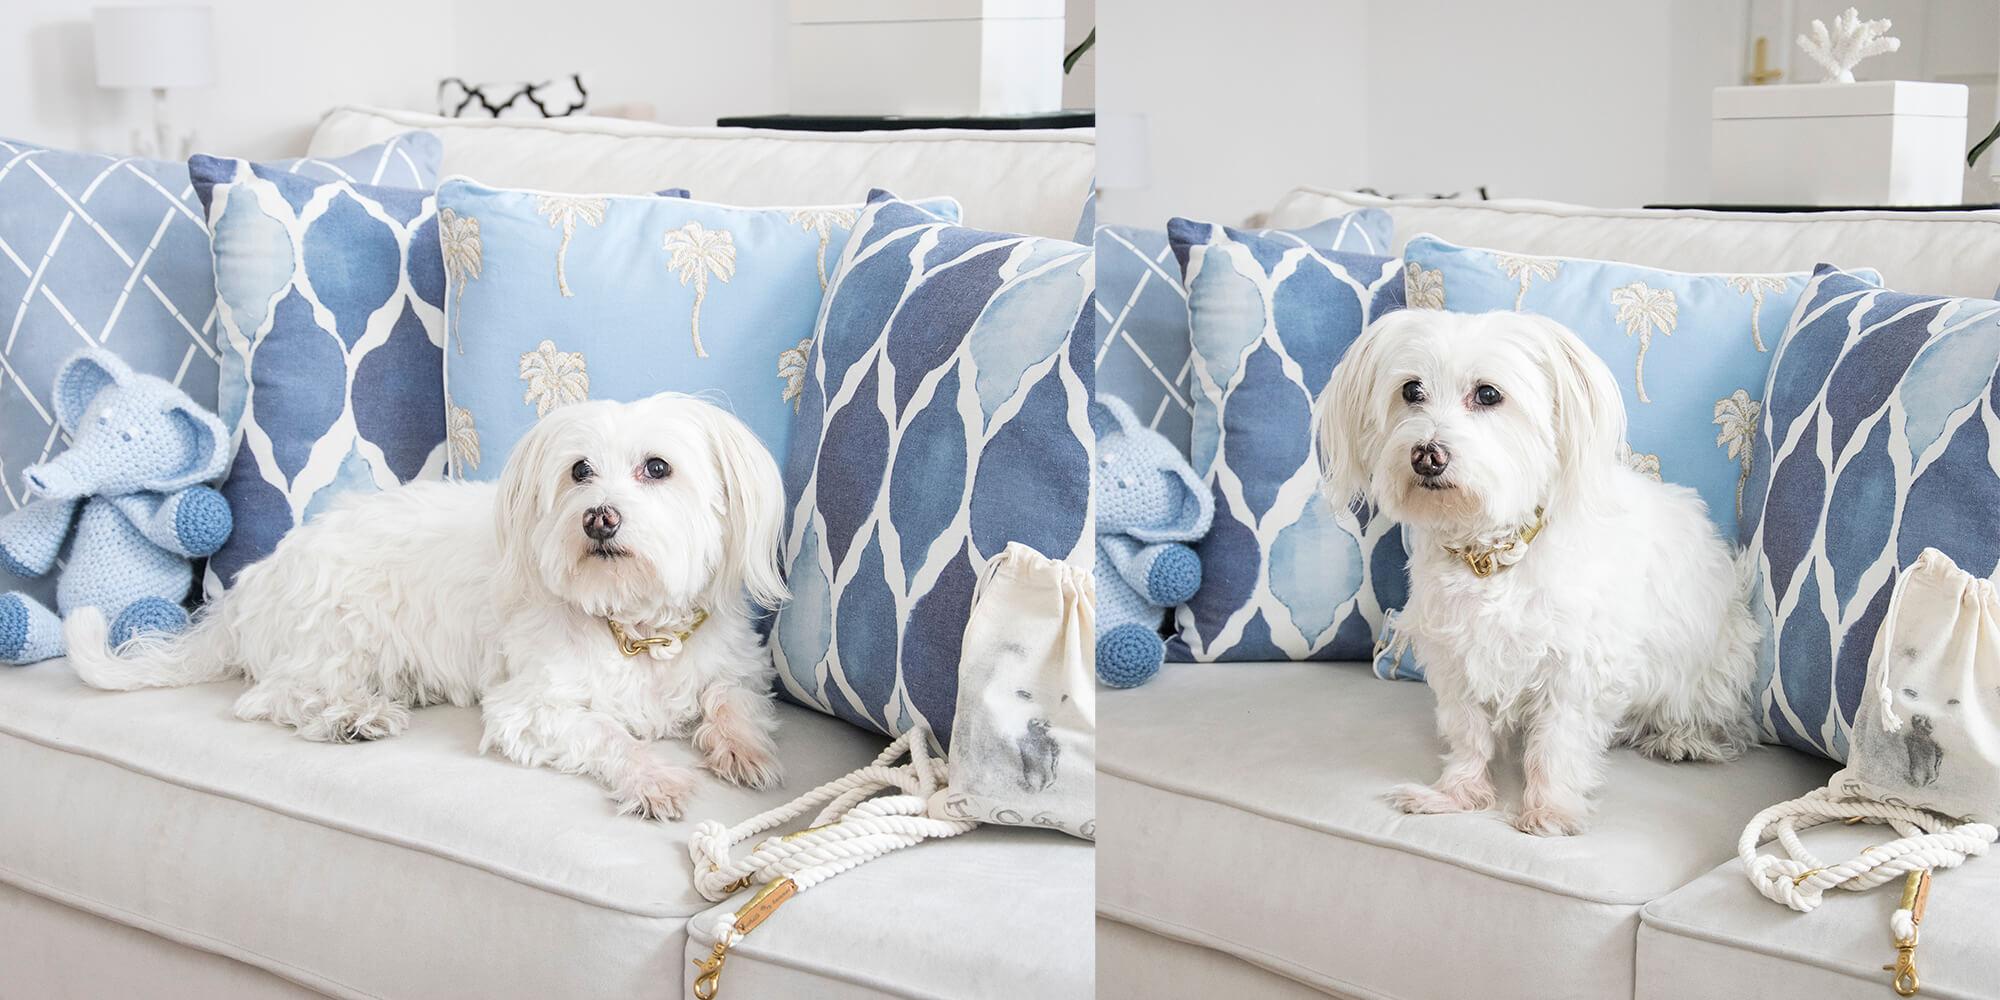 Baby-Blue: Trendige Hunde-Accessoires